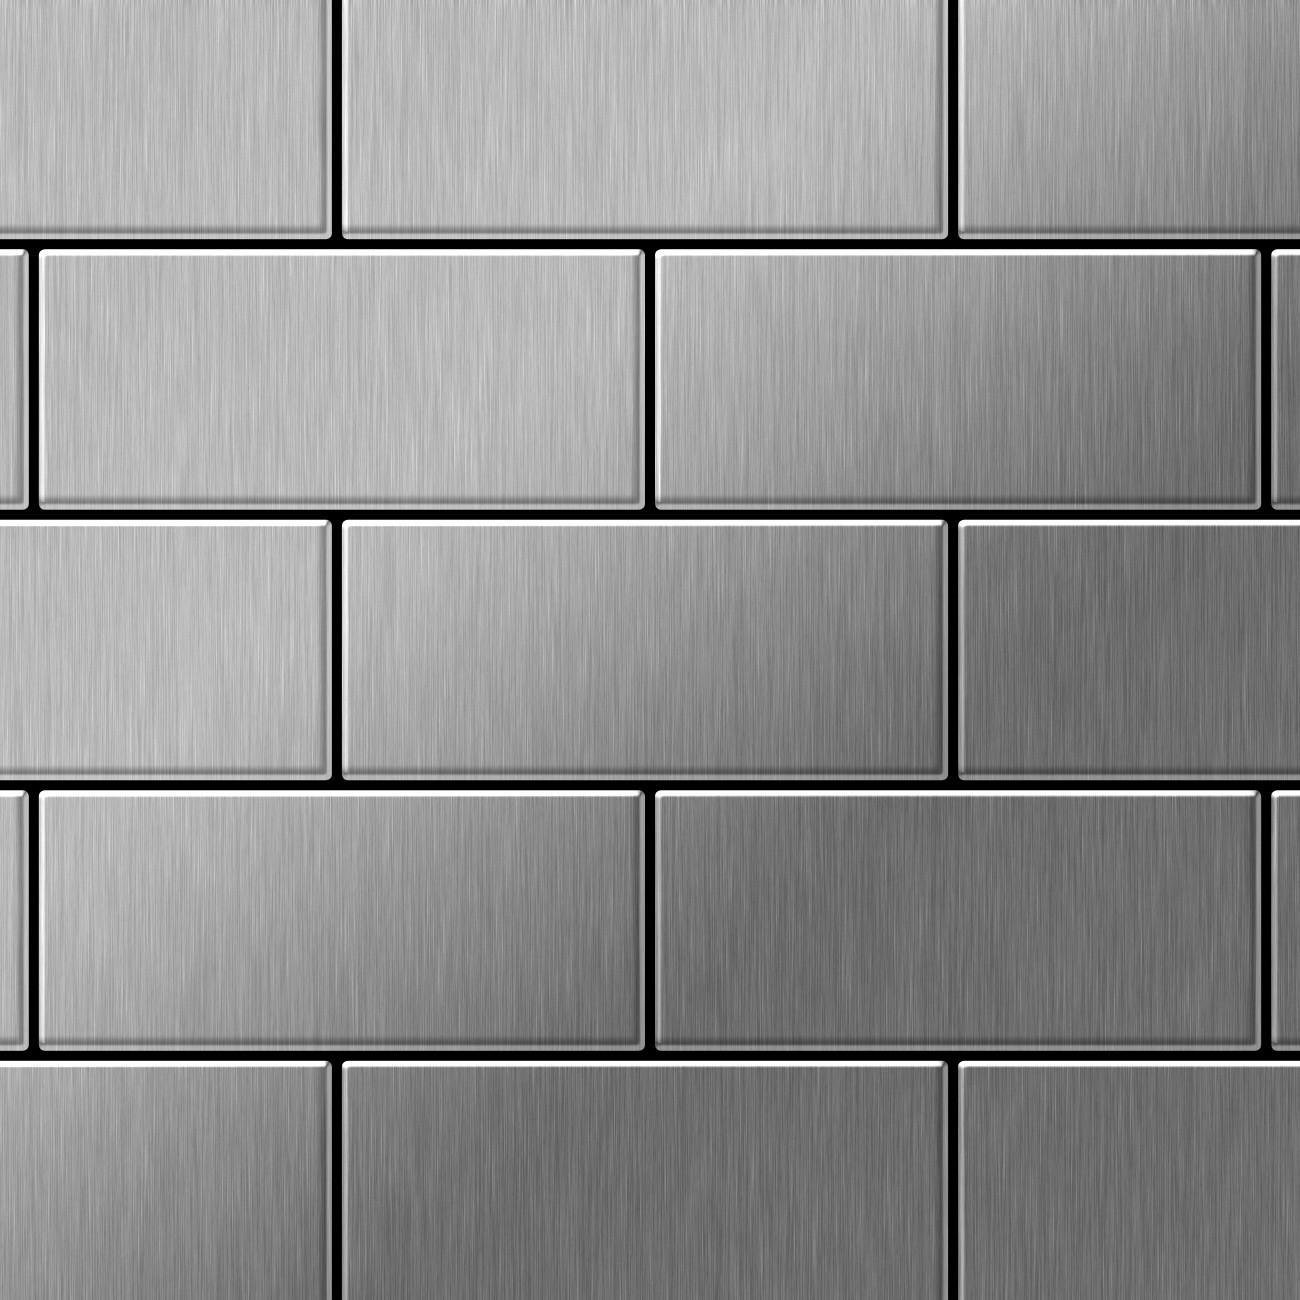 mosaik fliese massiv metall edelstahl geb rstet in grau 1 6mm stark alloy subway s s b 0 58 m2. Black Bedroom Furniture Sets. Home Design Ideas